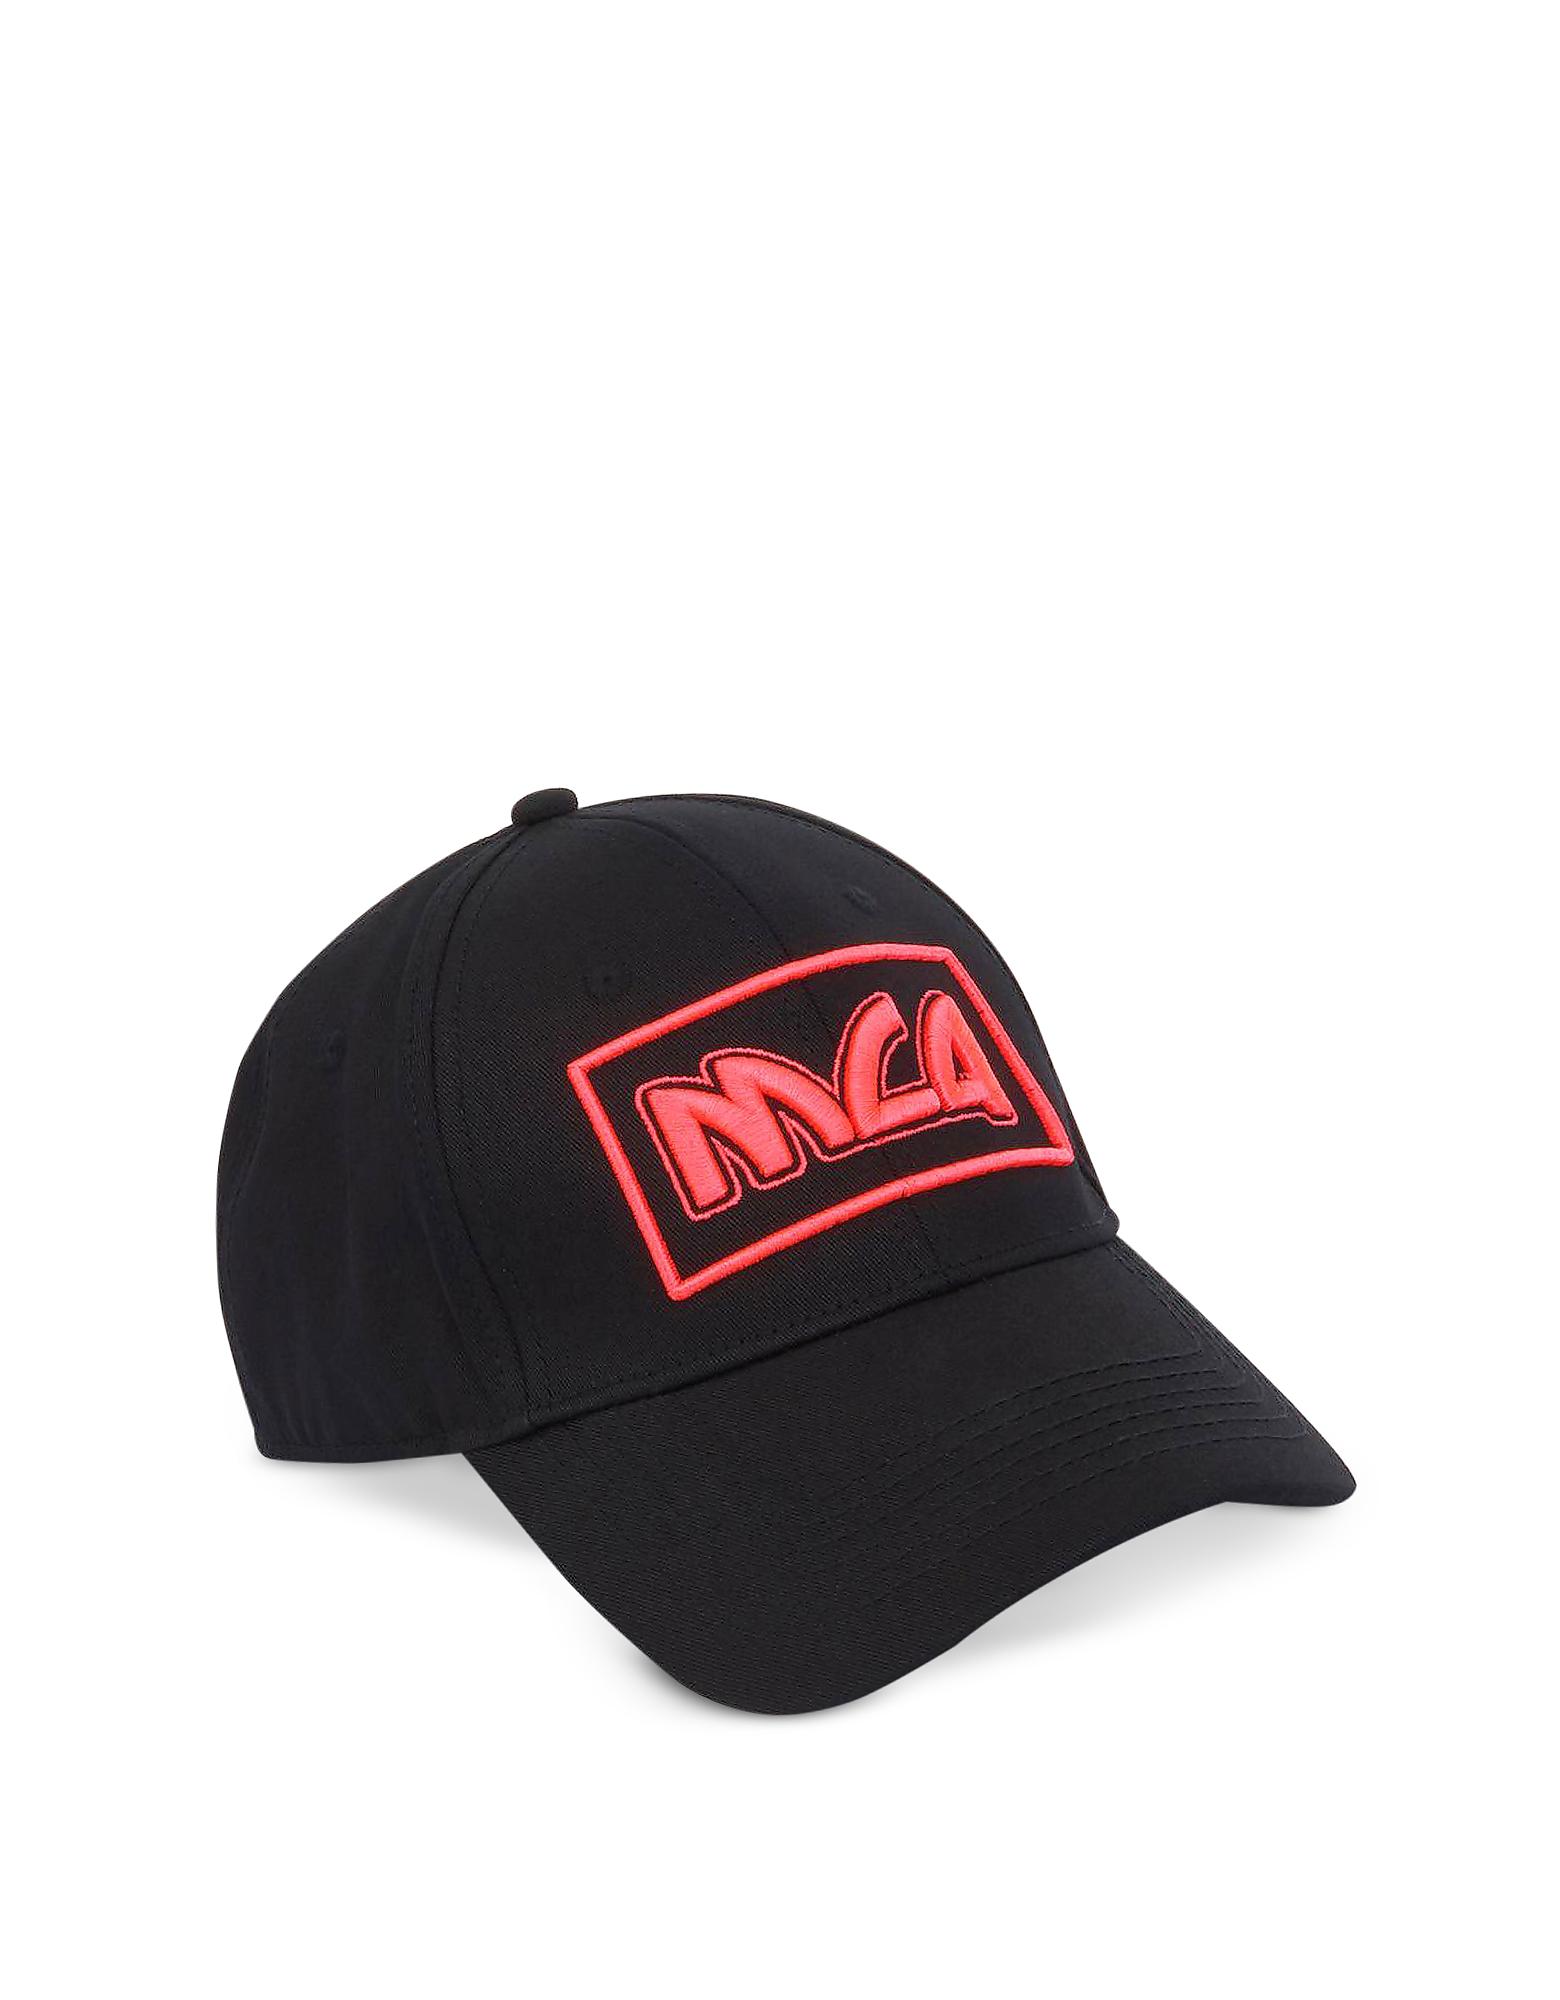 McQ Alexander McQueen Men's Hats, Metal Logo Cotton Baseball Cap